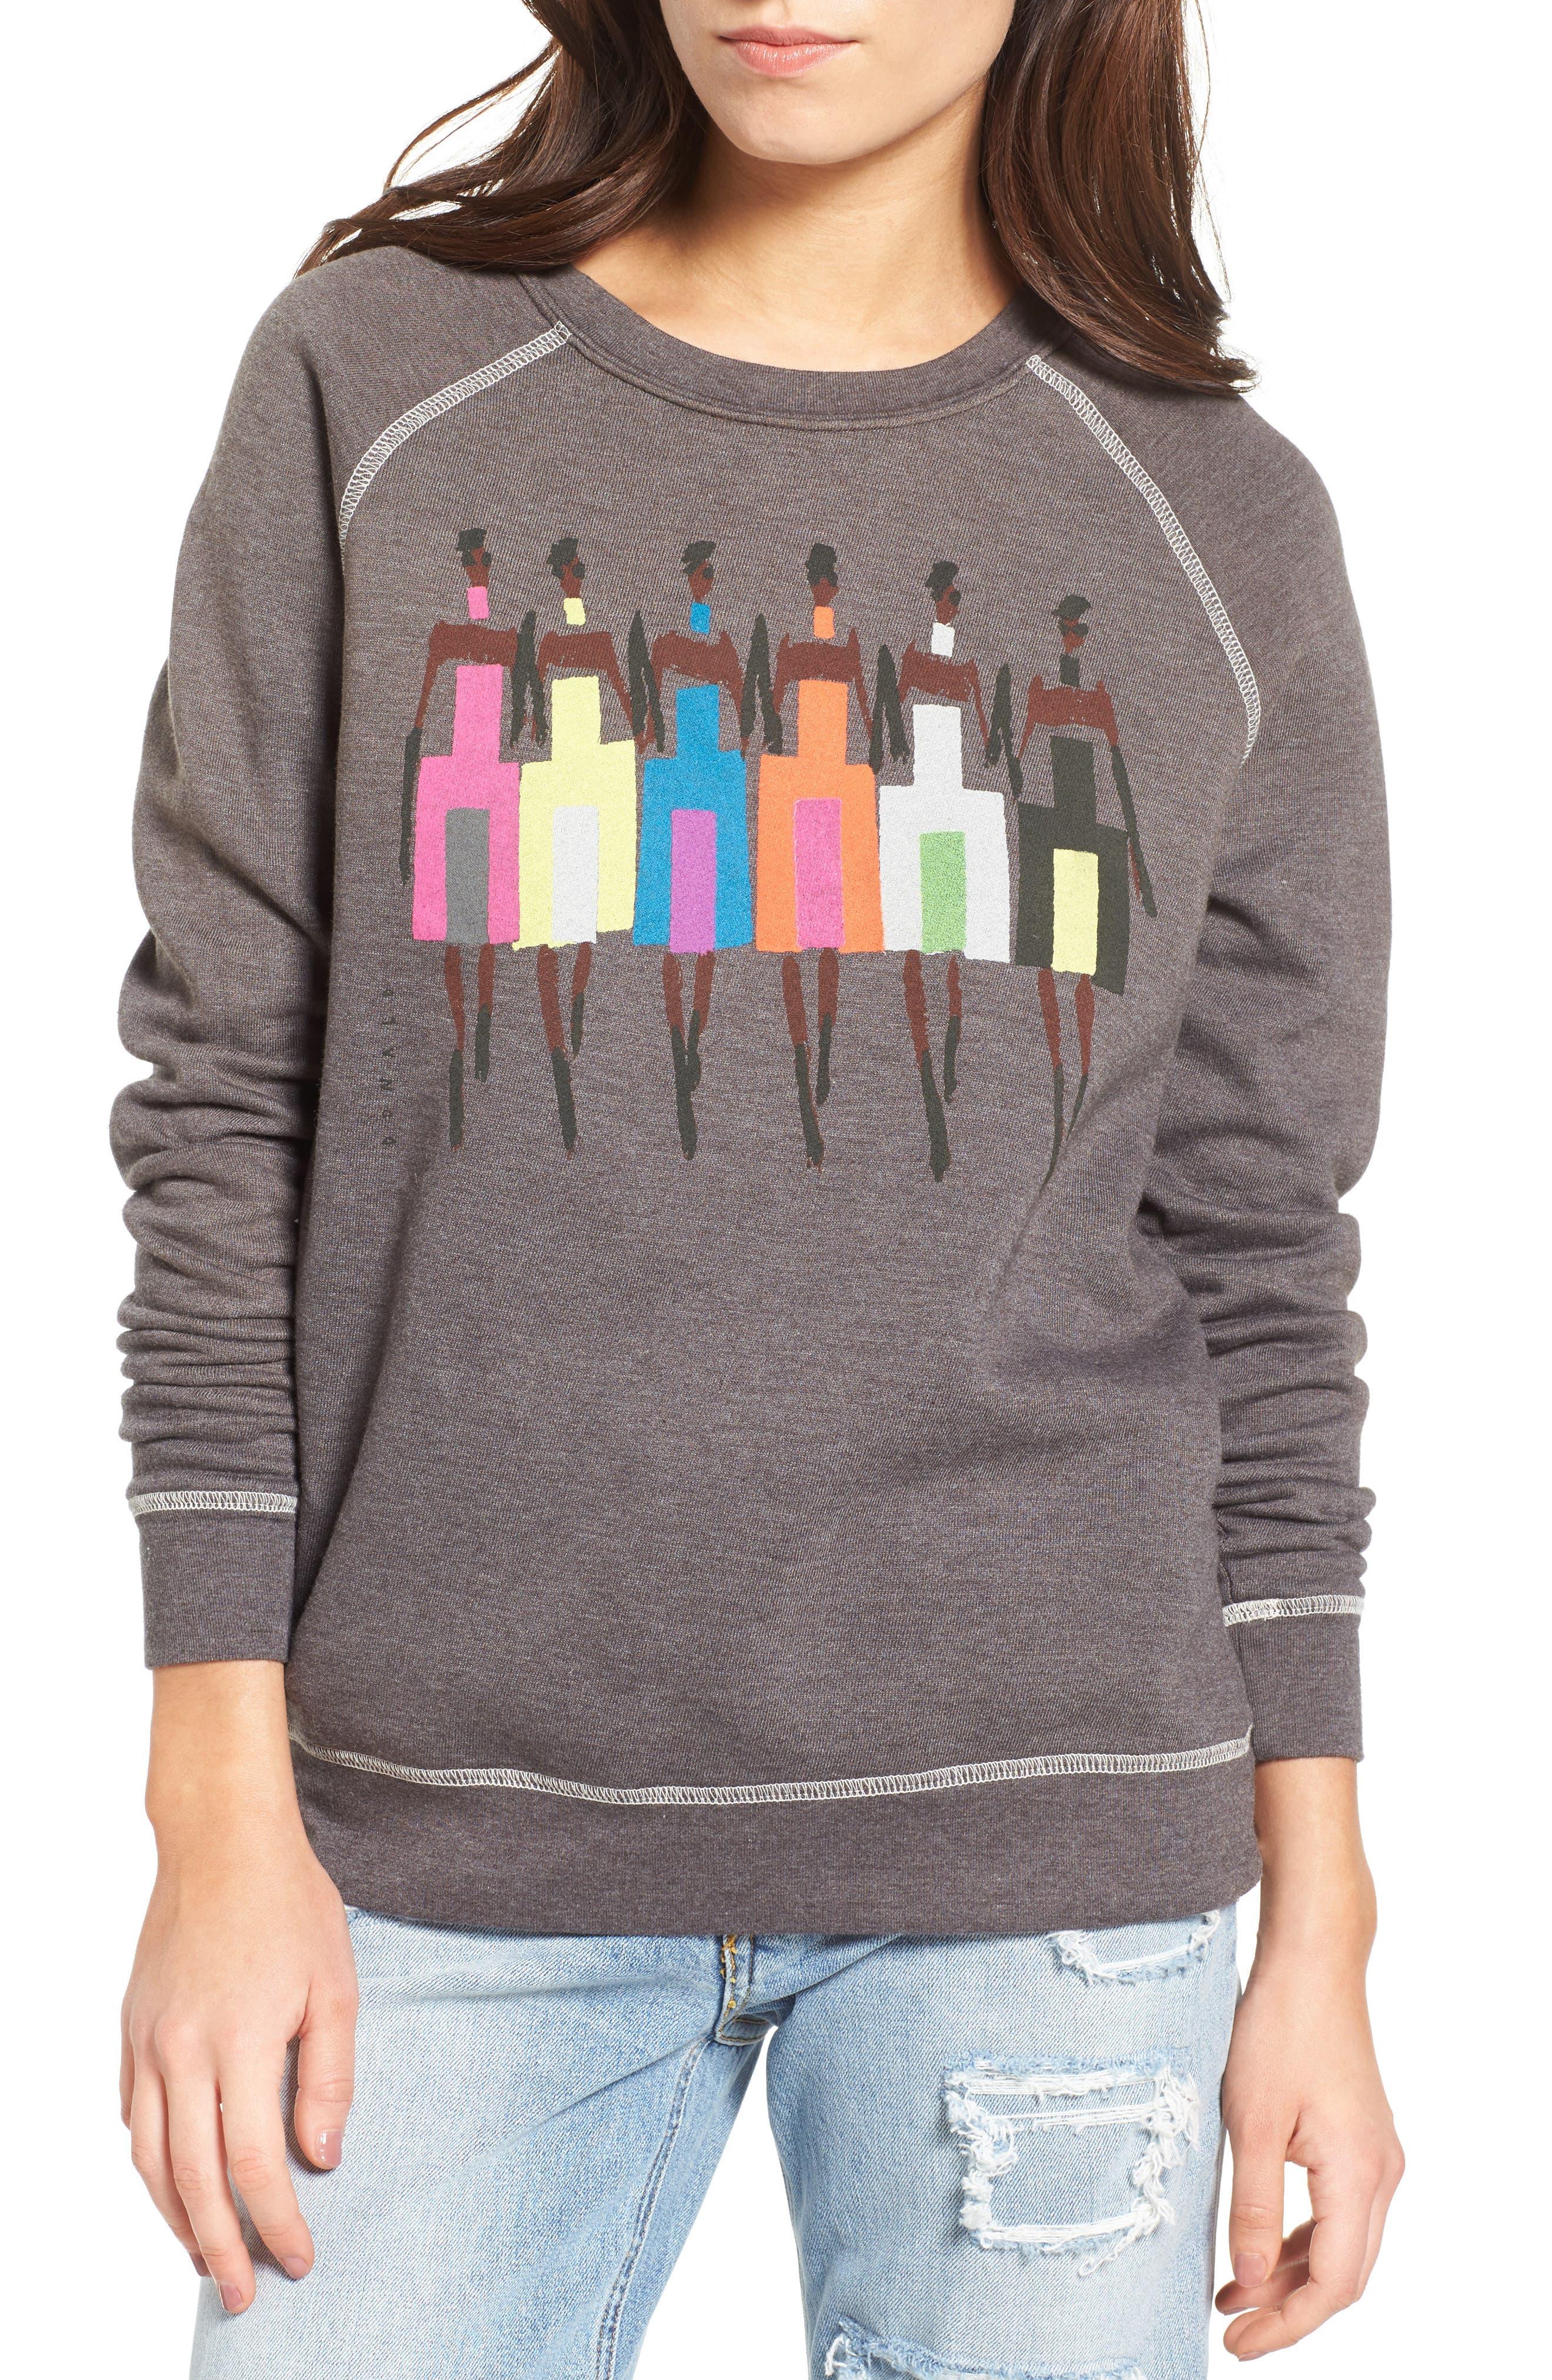 Main Image - Junk Food Donald Robertson Girls Sweatshirt